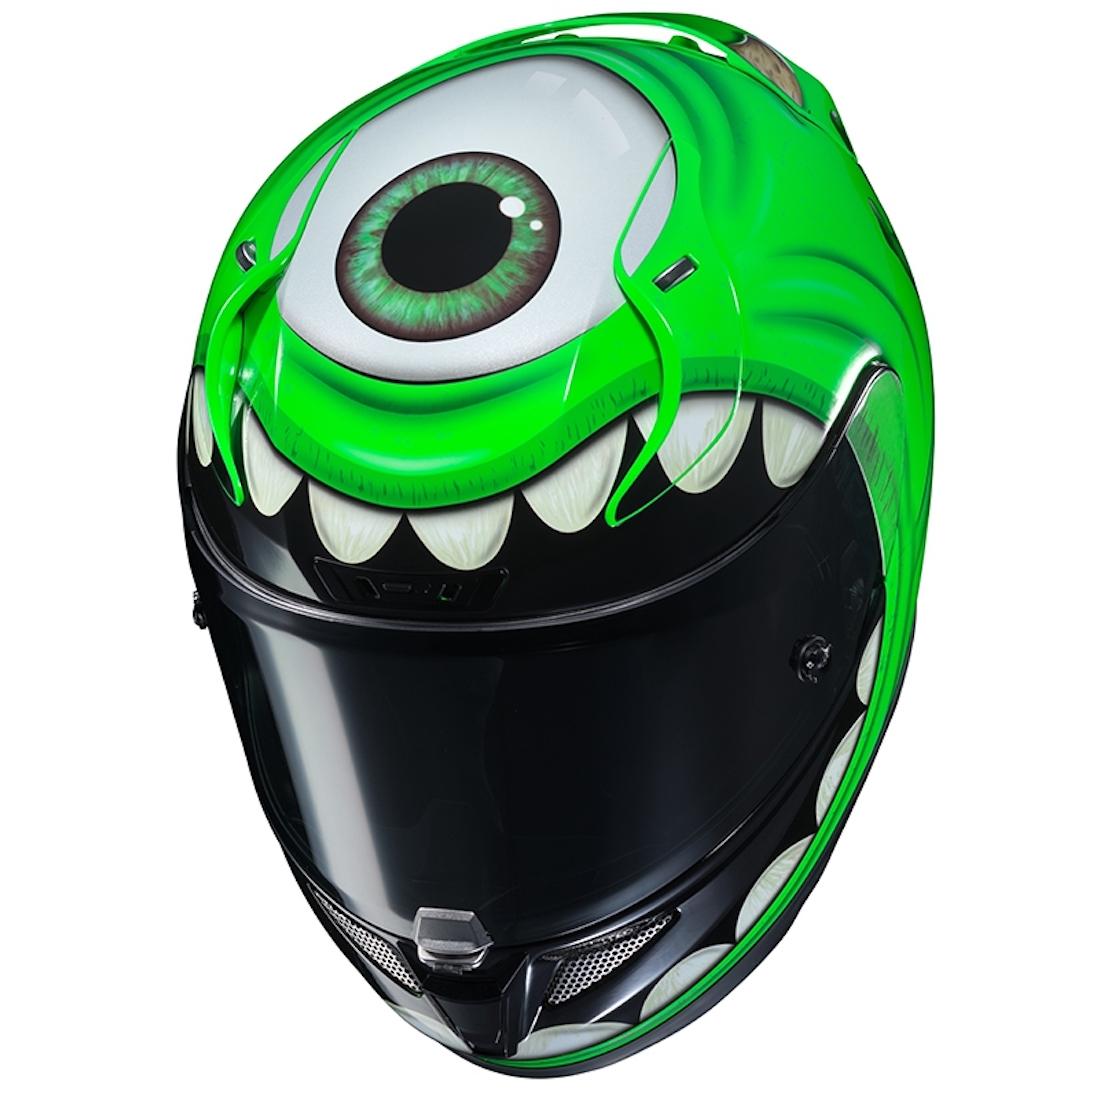 new monsters inc hjc rpha 11 helmet unve visordown. Black Bedroom Furniture Sets. Home Design Ideas